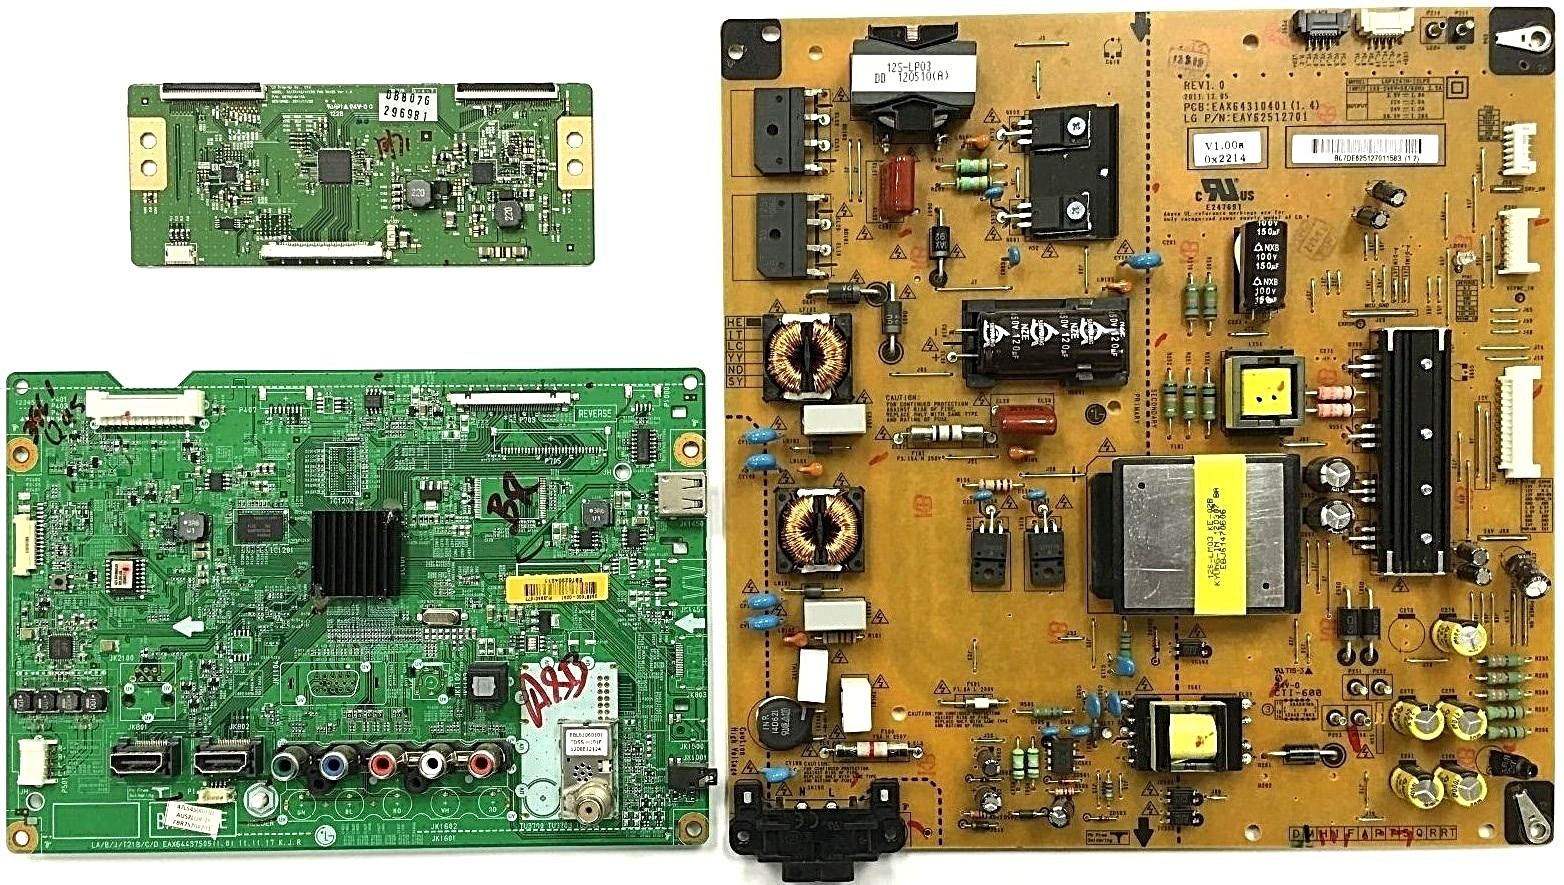 LG EAY60908801 (LGP4247-10 IOP) Power Supply for 55LE5500